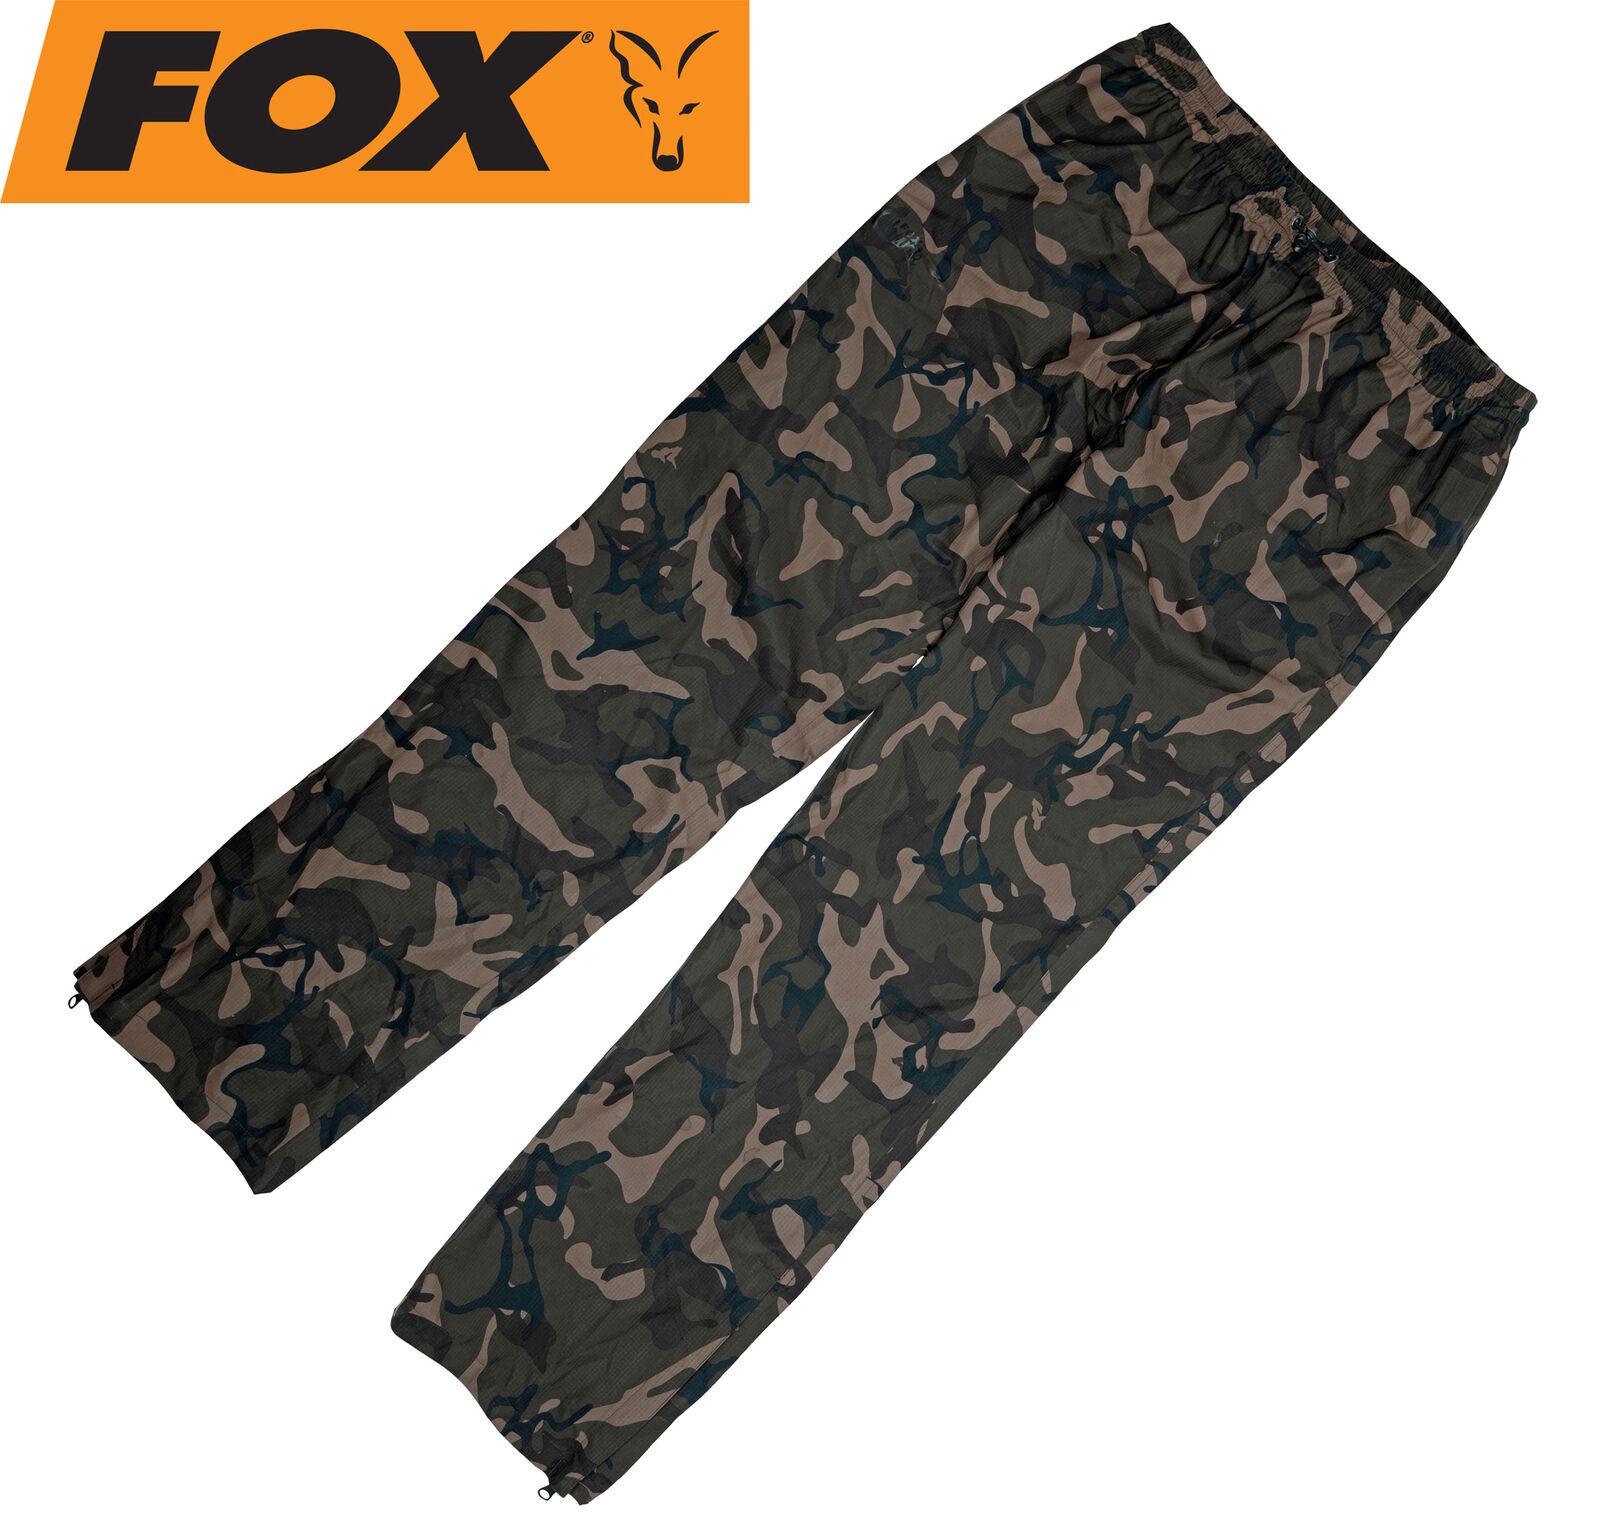 Fox Chunk Camo 10k Lightweight RS Trousers - Regenhose, Regenbekleidung Regenbekleidung Regenhose, 0f7c02